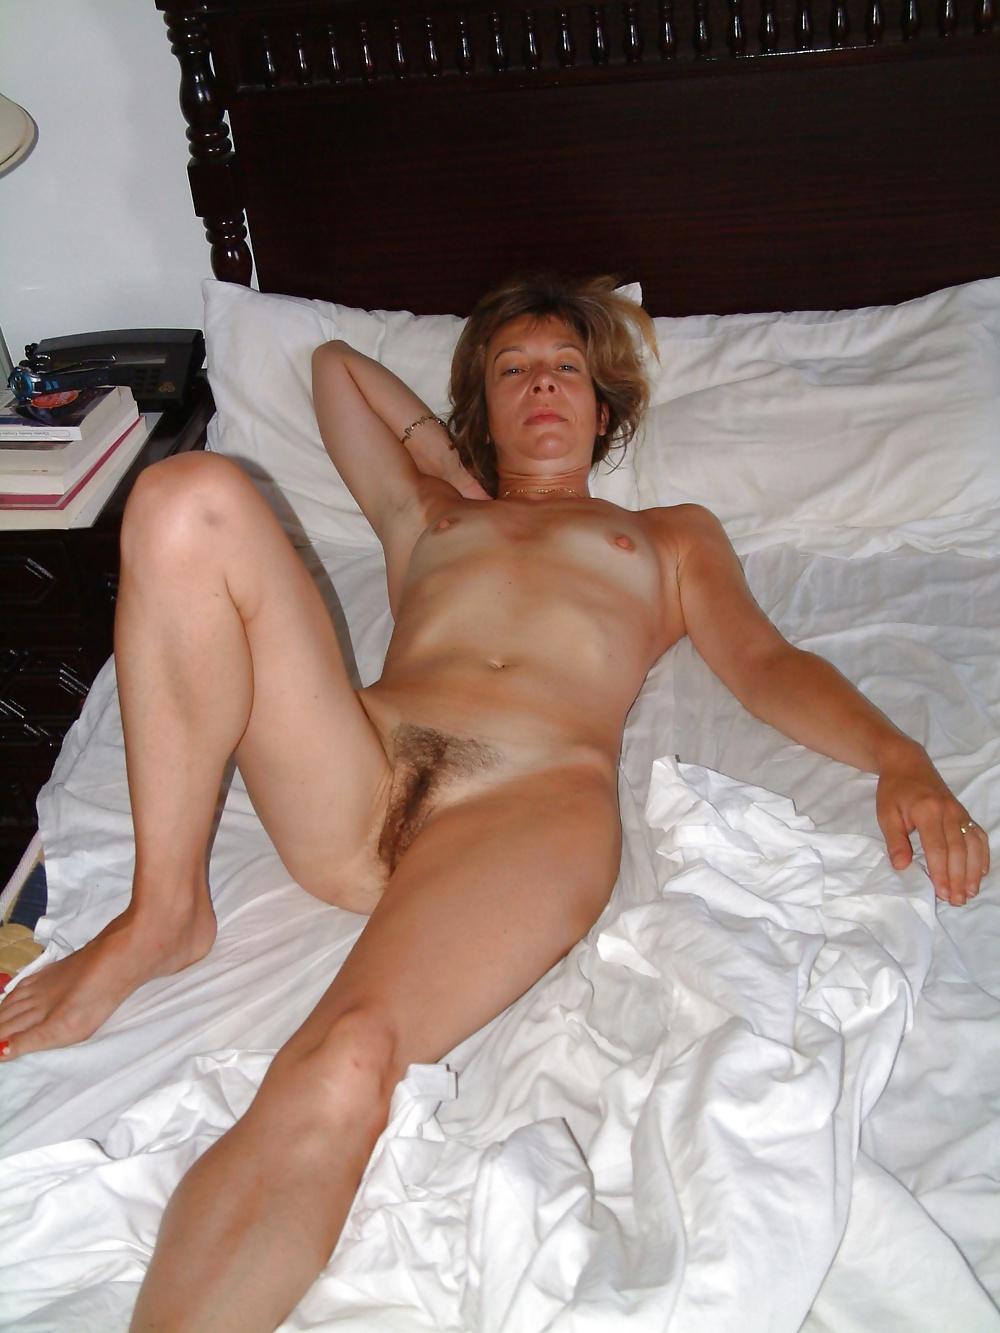 Naked mature women pics